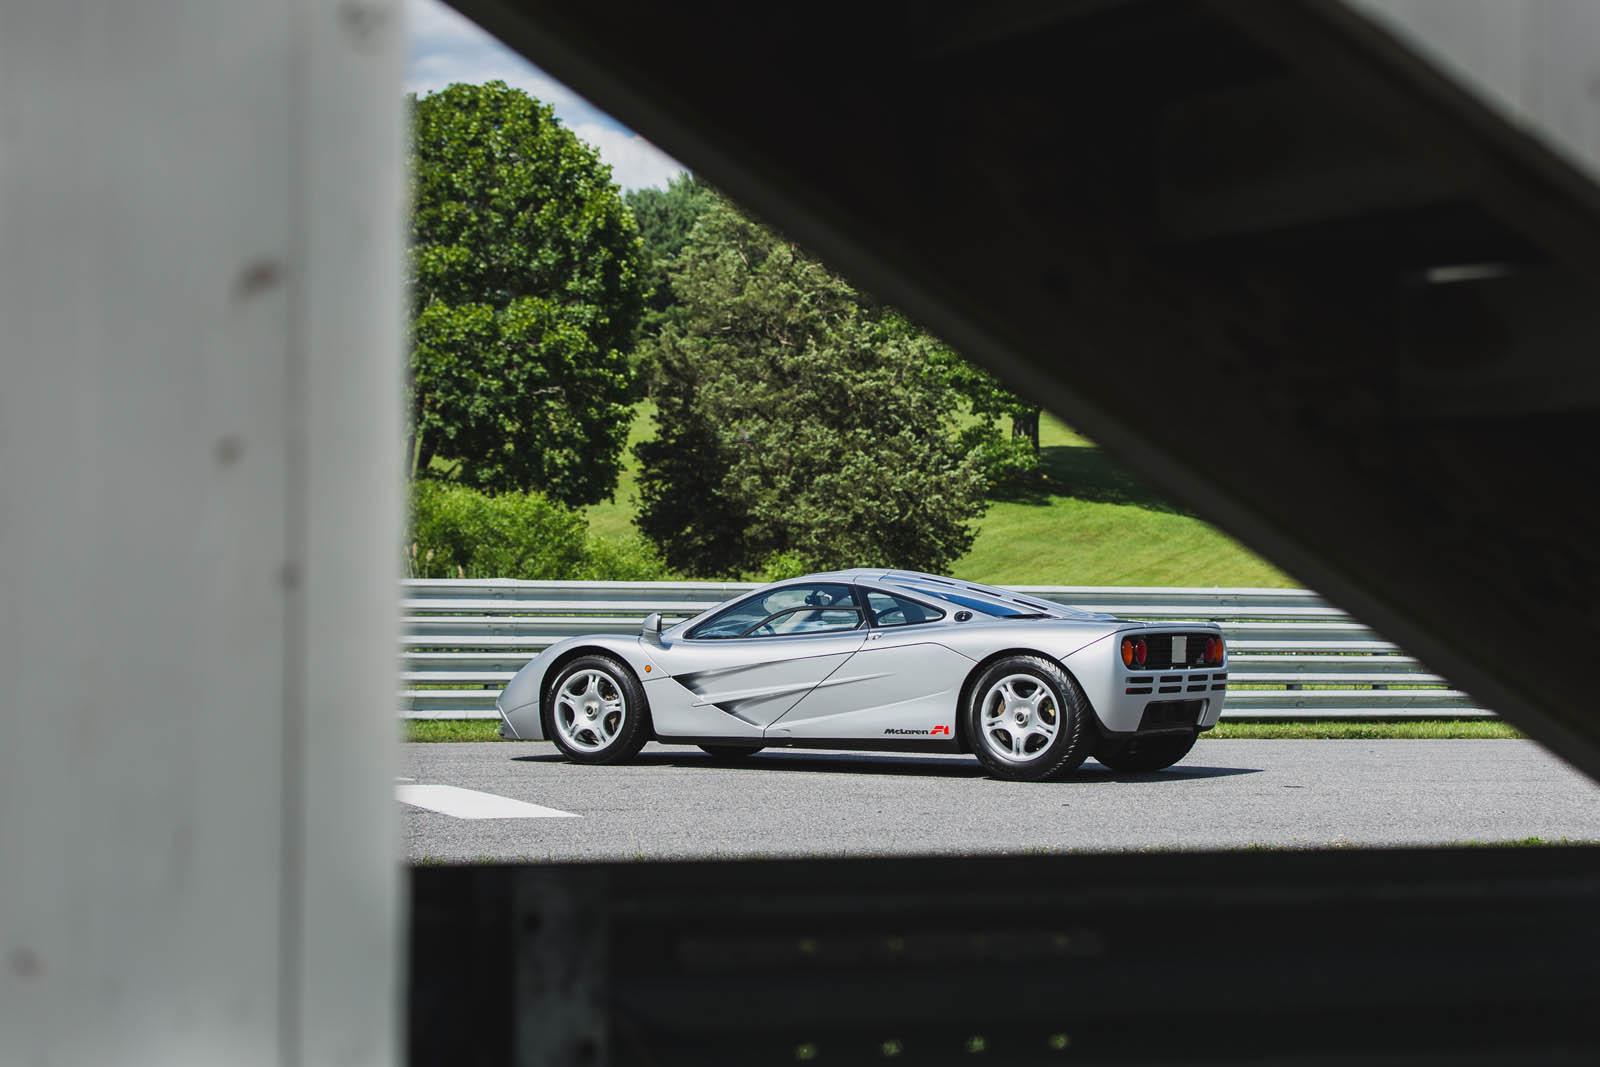 McLaren_F1-34 copy